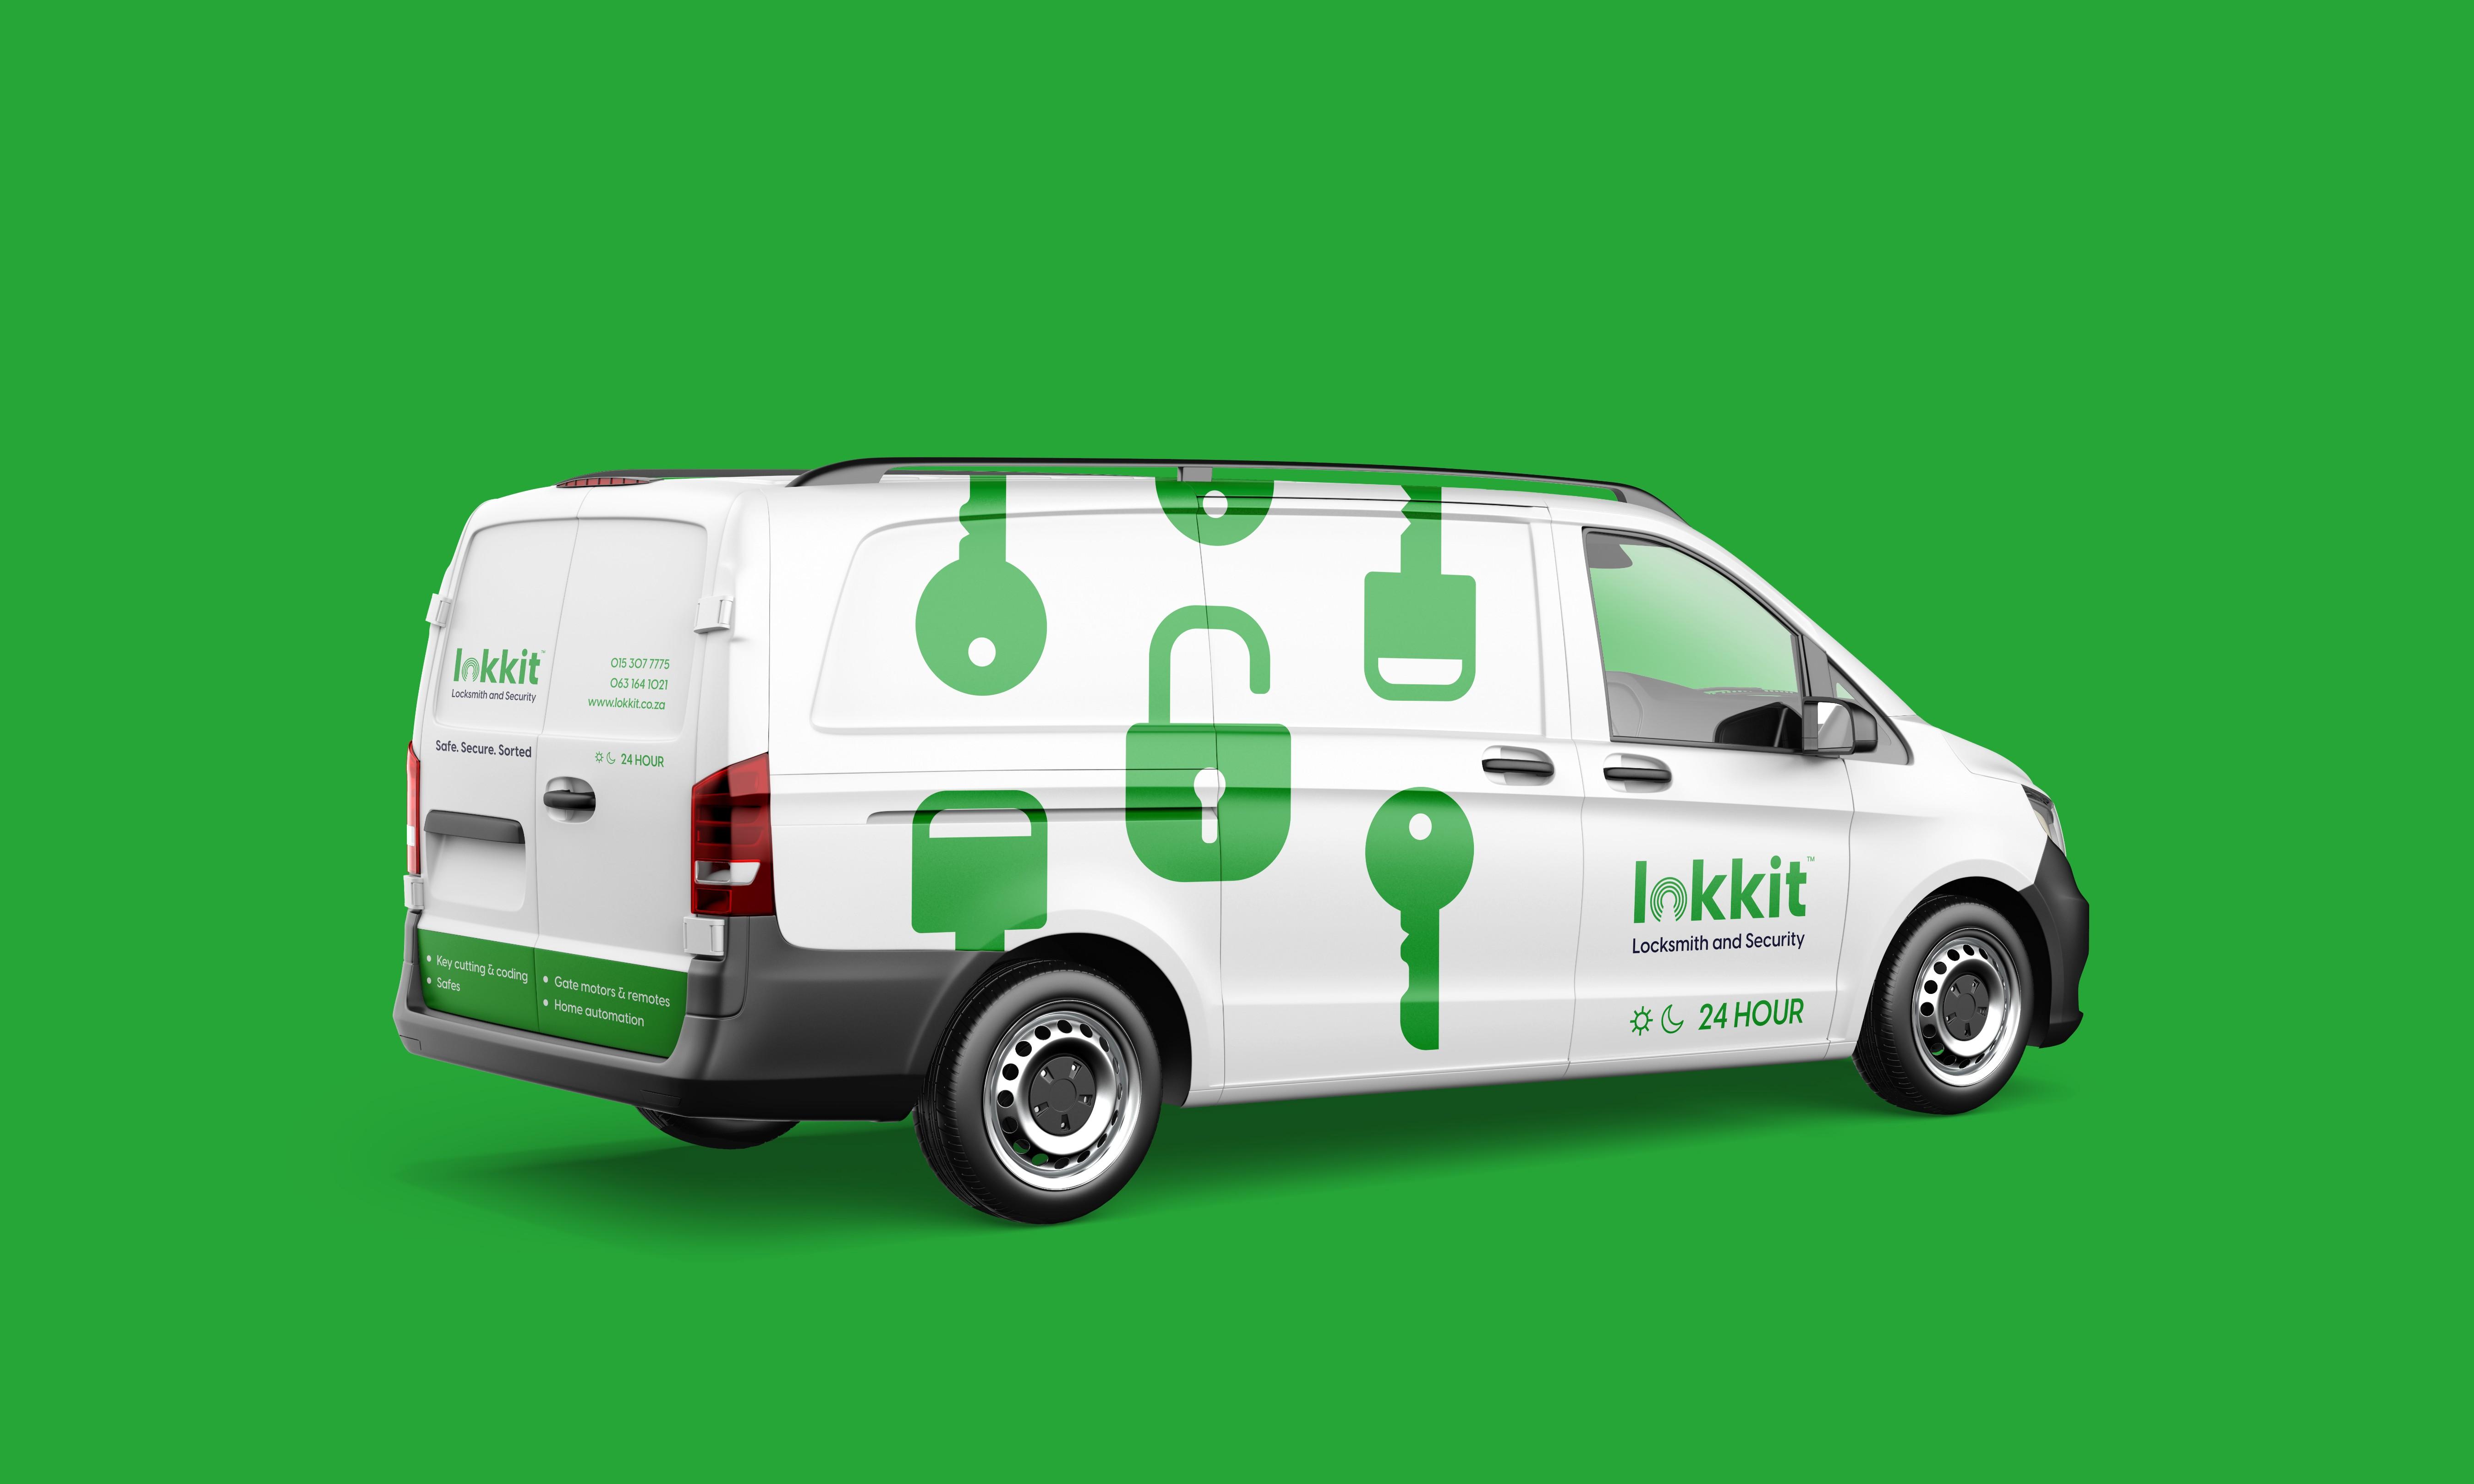 Lokkit Locksmith Vehicle Branding